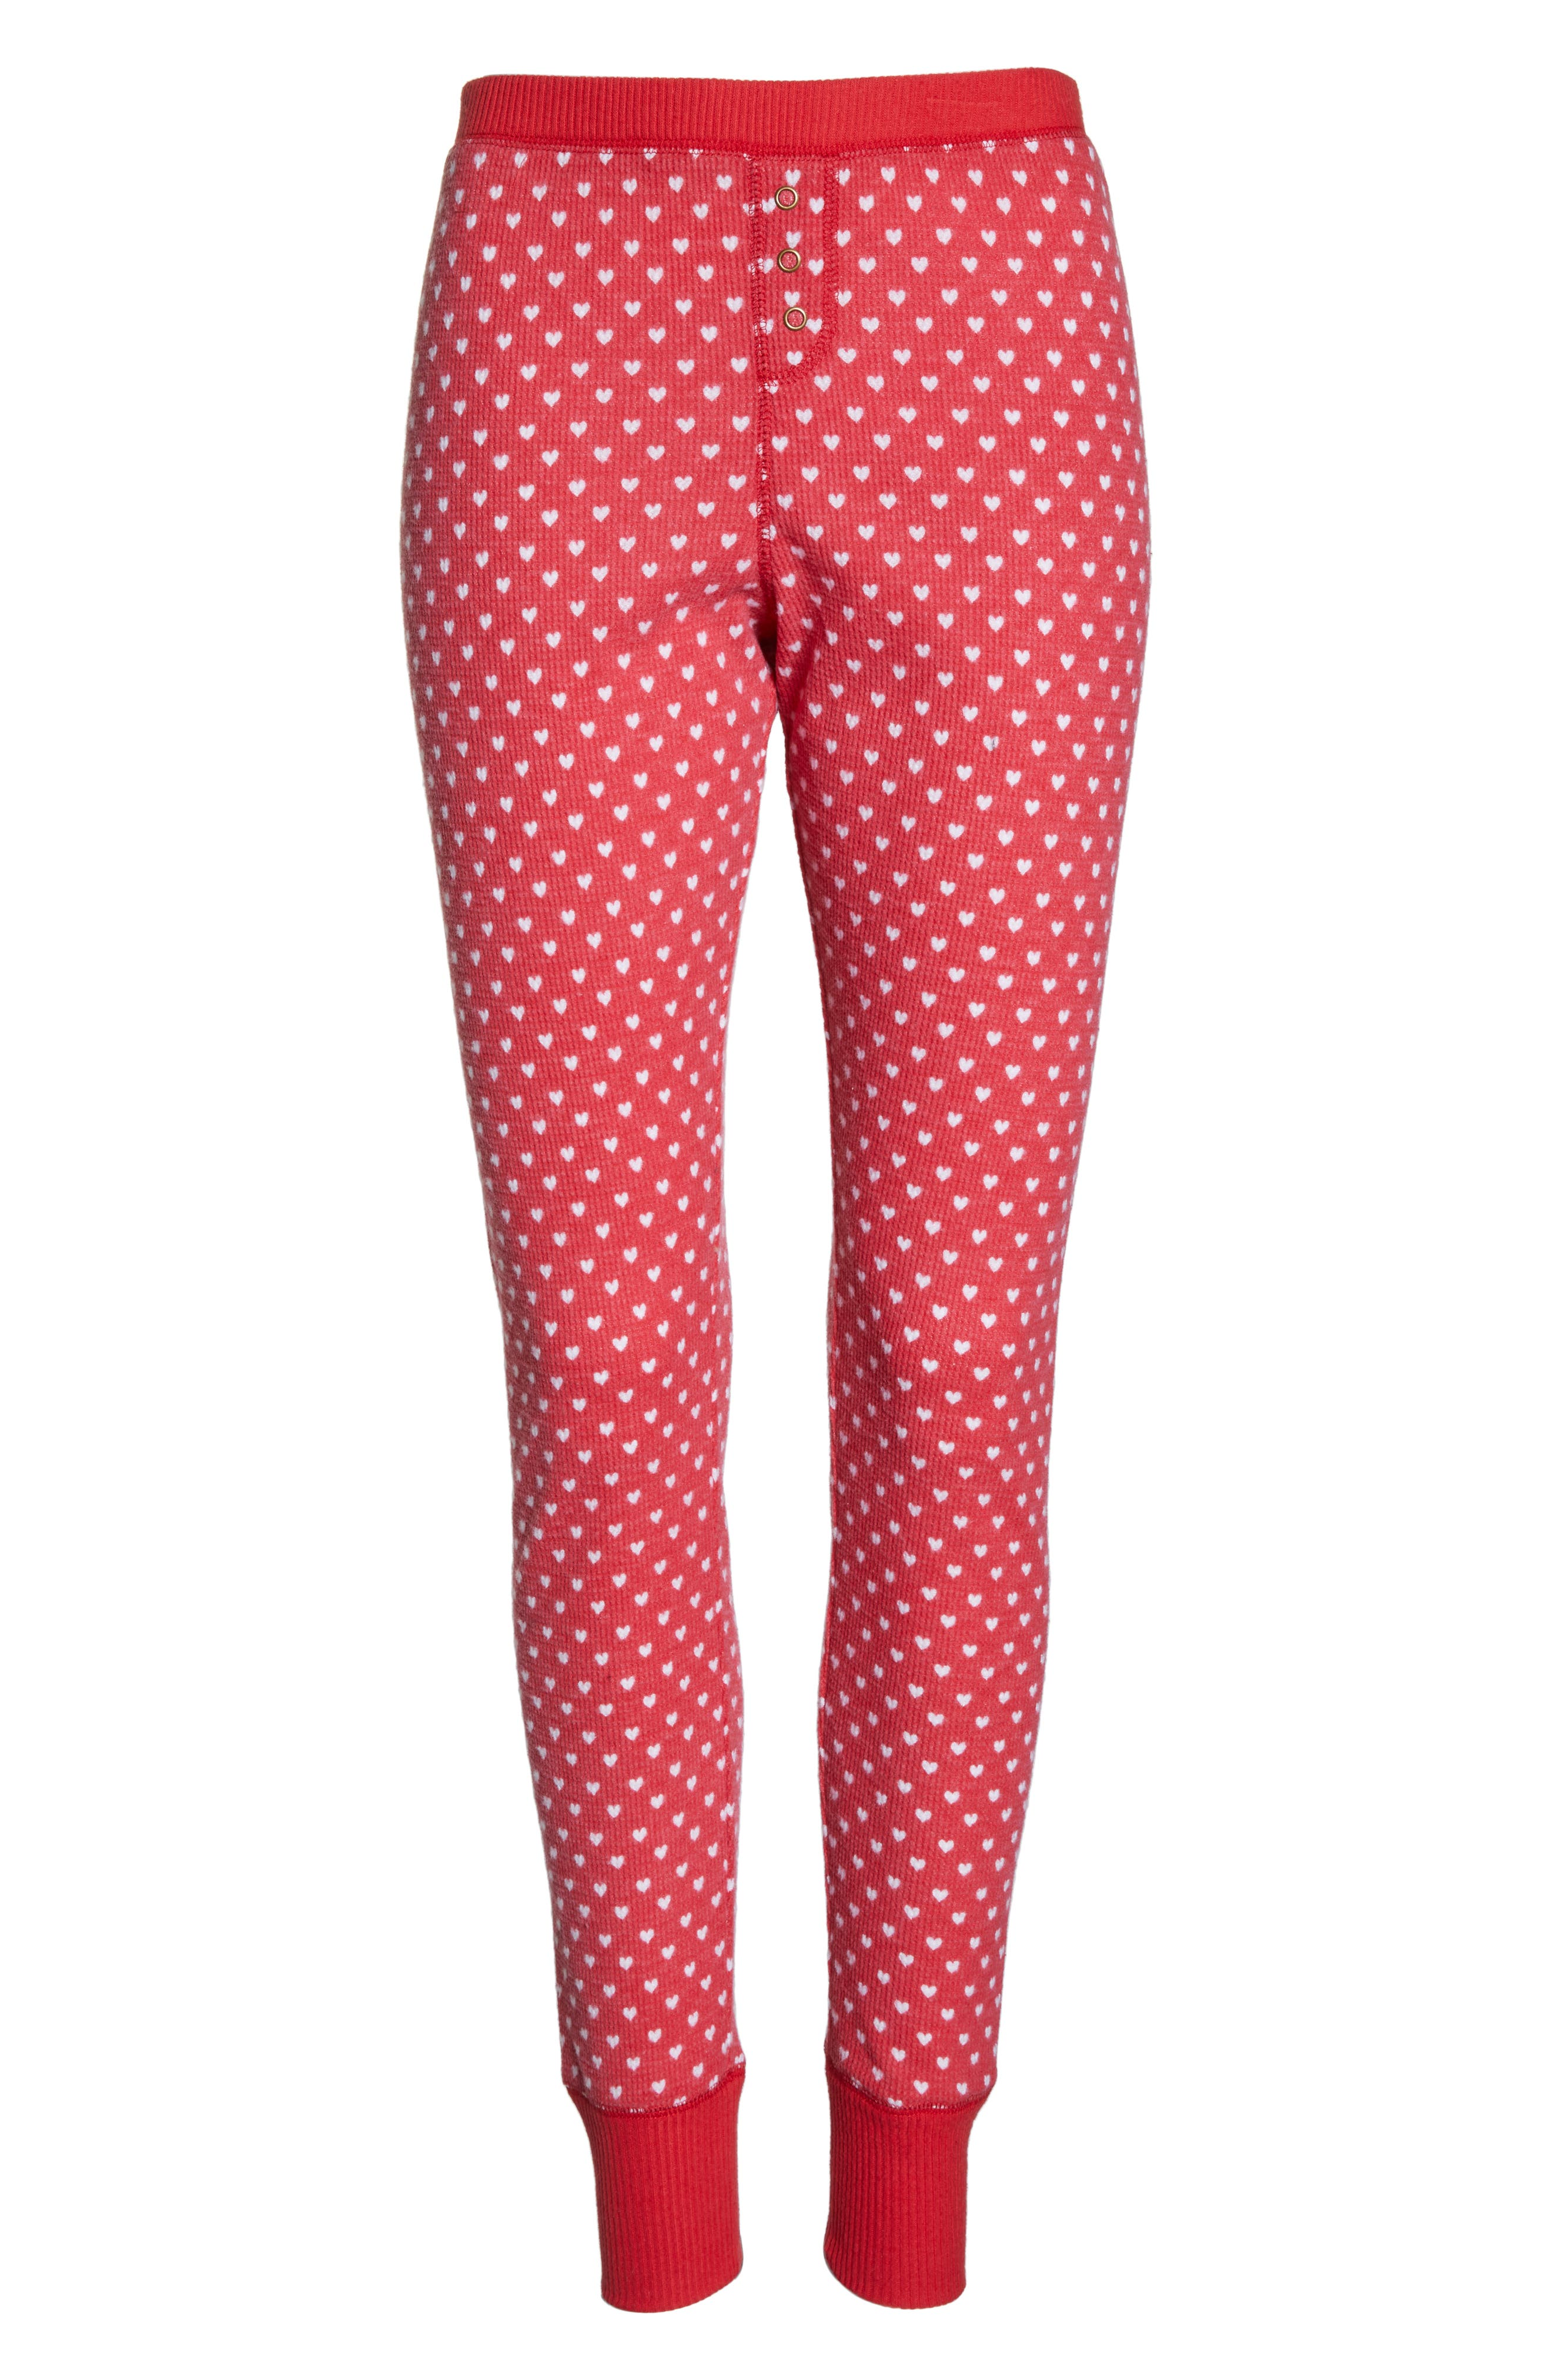 Thermal Leggings,                             Alternate thumbnail 6, color,                             RED LIPSTICK HEART